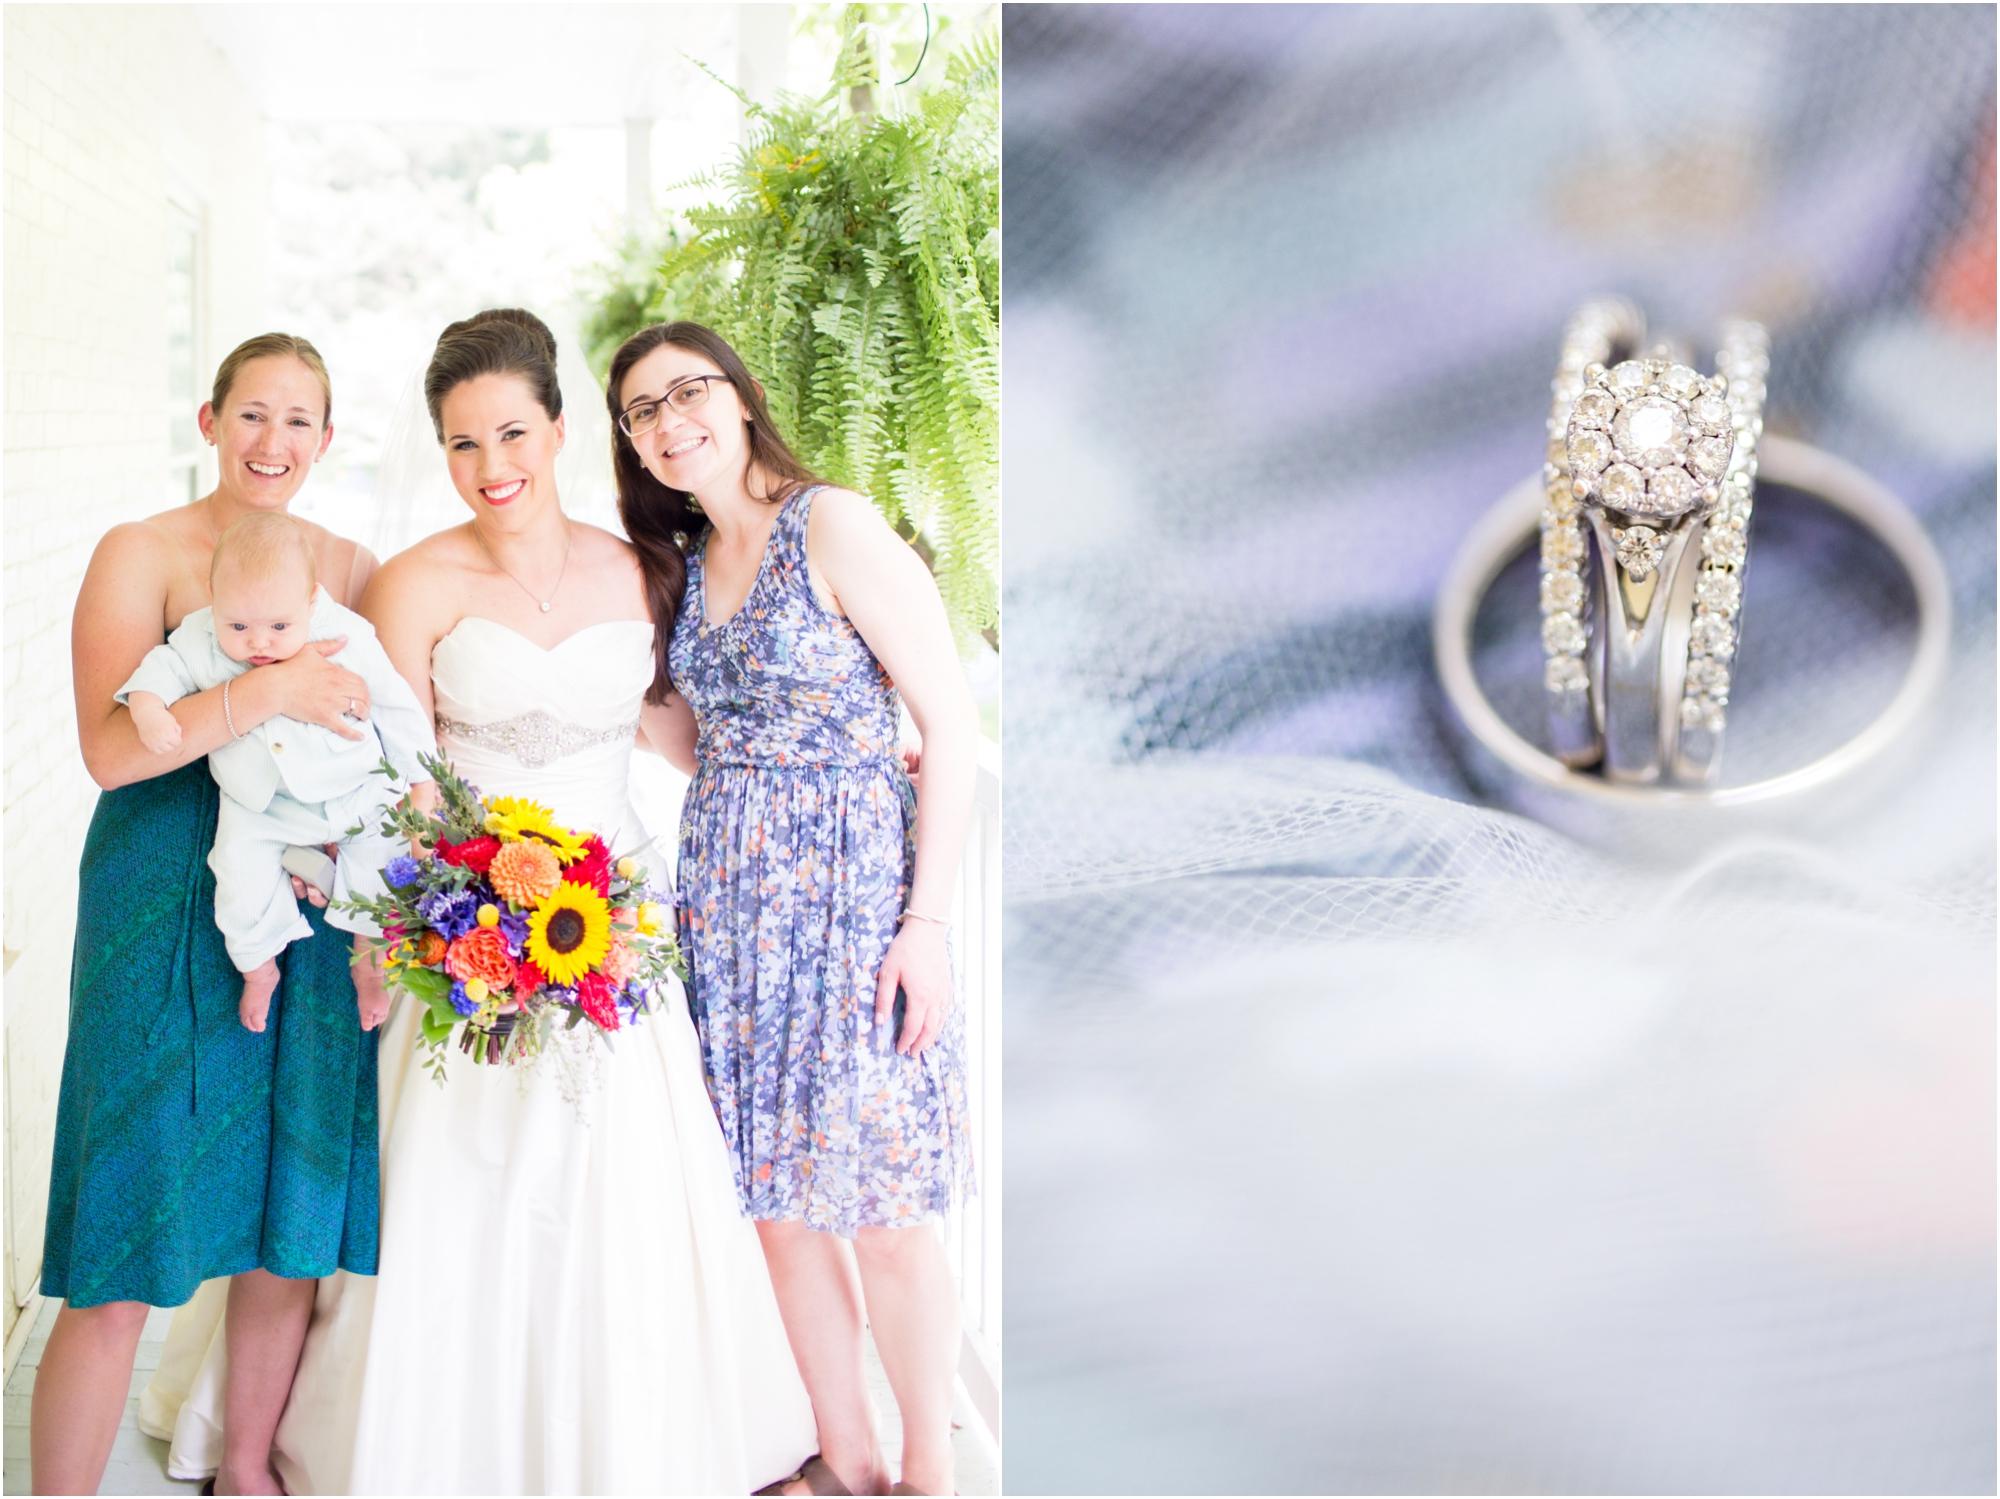 2-Berkstresser Wedding Getting Ready-274_anna grace photography pennsylvania wedding photographer riverdale manor.jpg